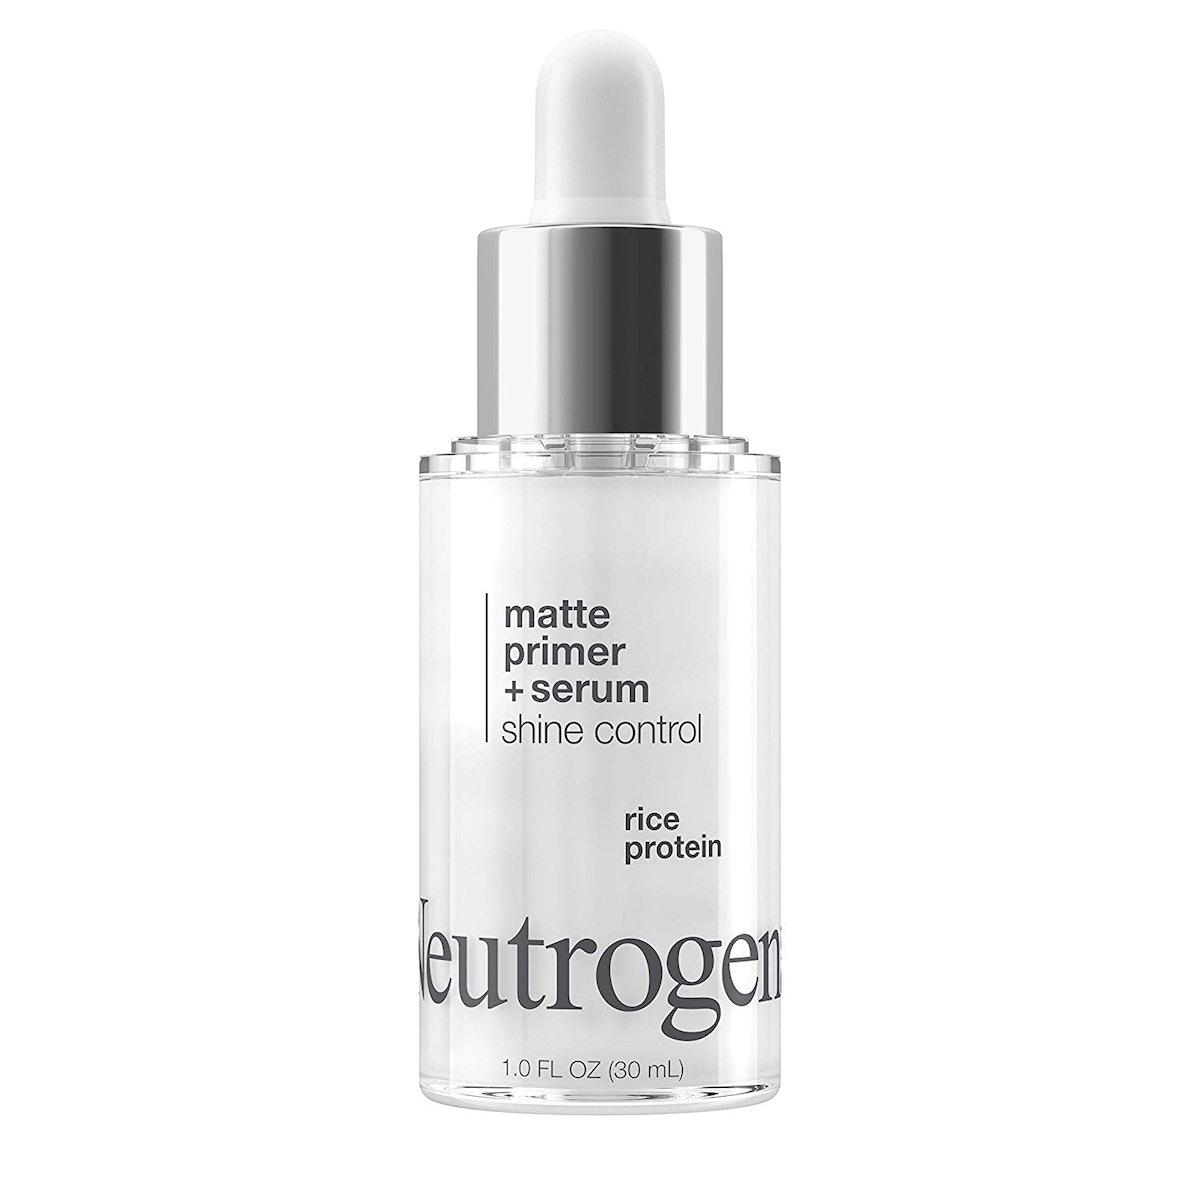 Neutrogena Matte Primer + Serum Shine Control